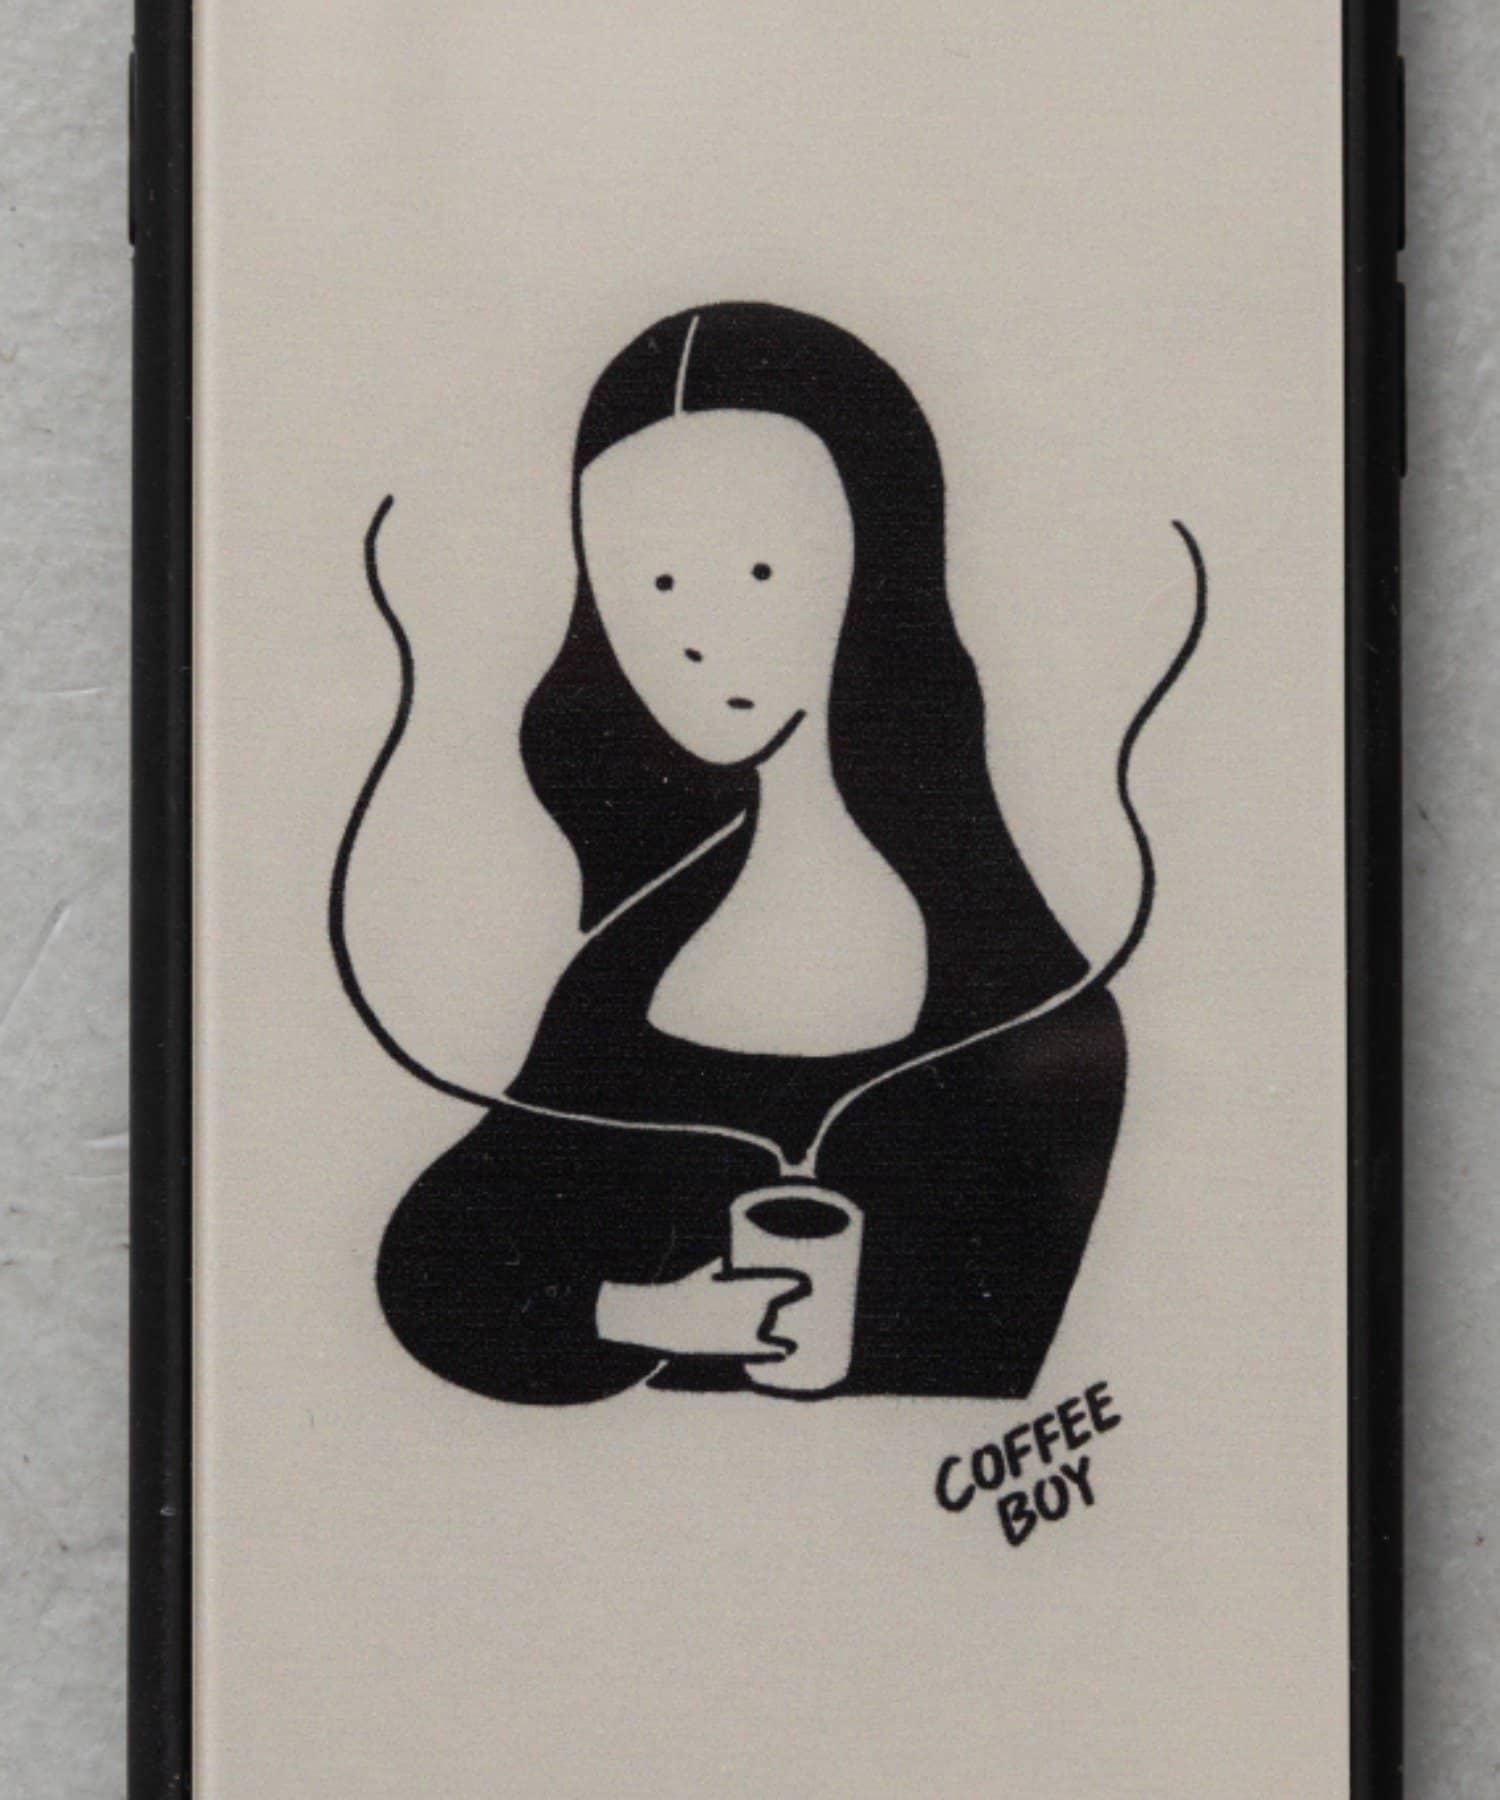 BIRTHDAY BAR(バースデイバー) レディース 【受注予約】COFFEE BOY iPhoneケース ベージュ系その他